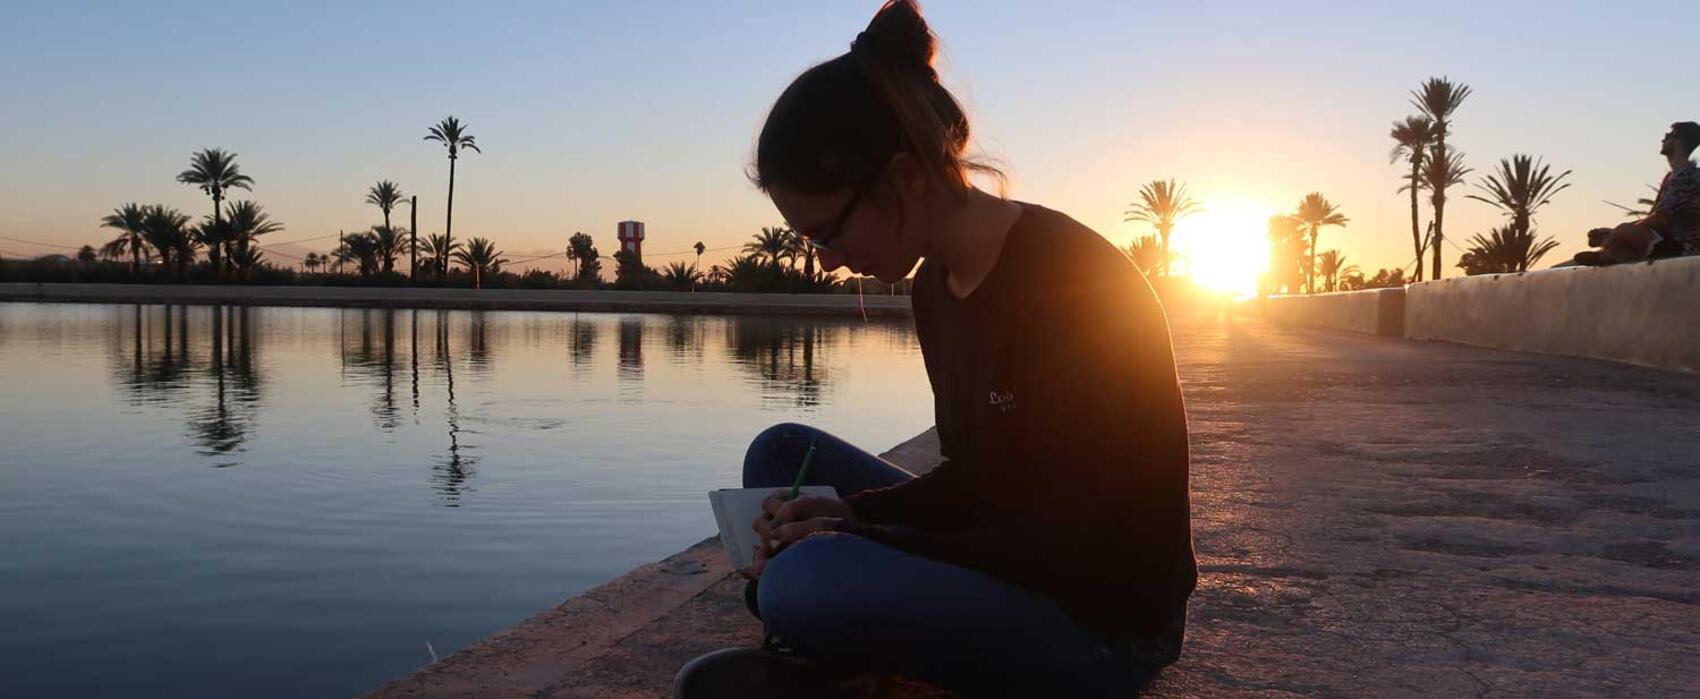 woman-writting-maroc